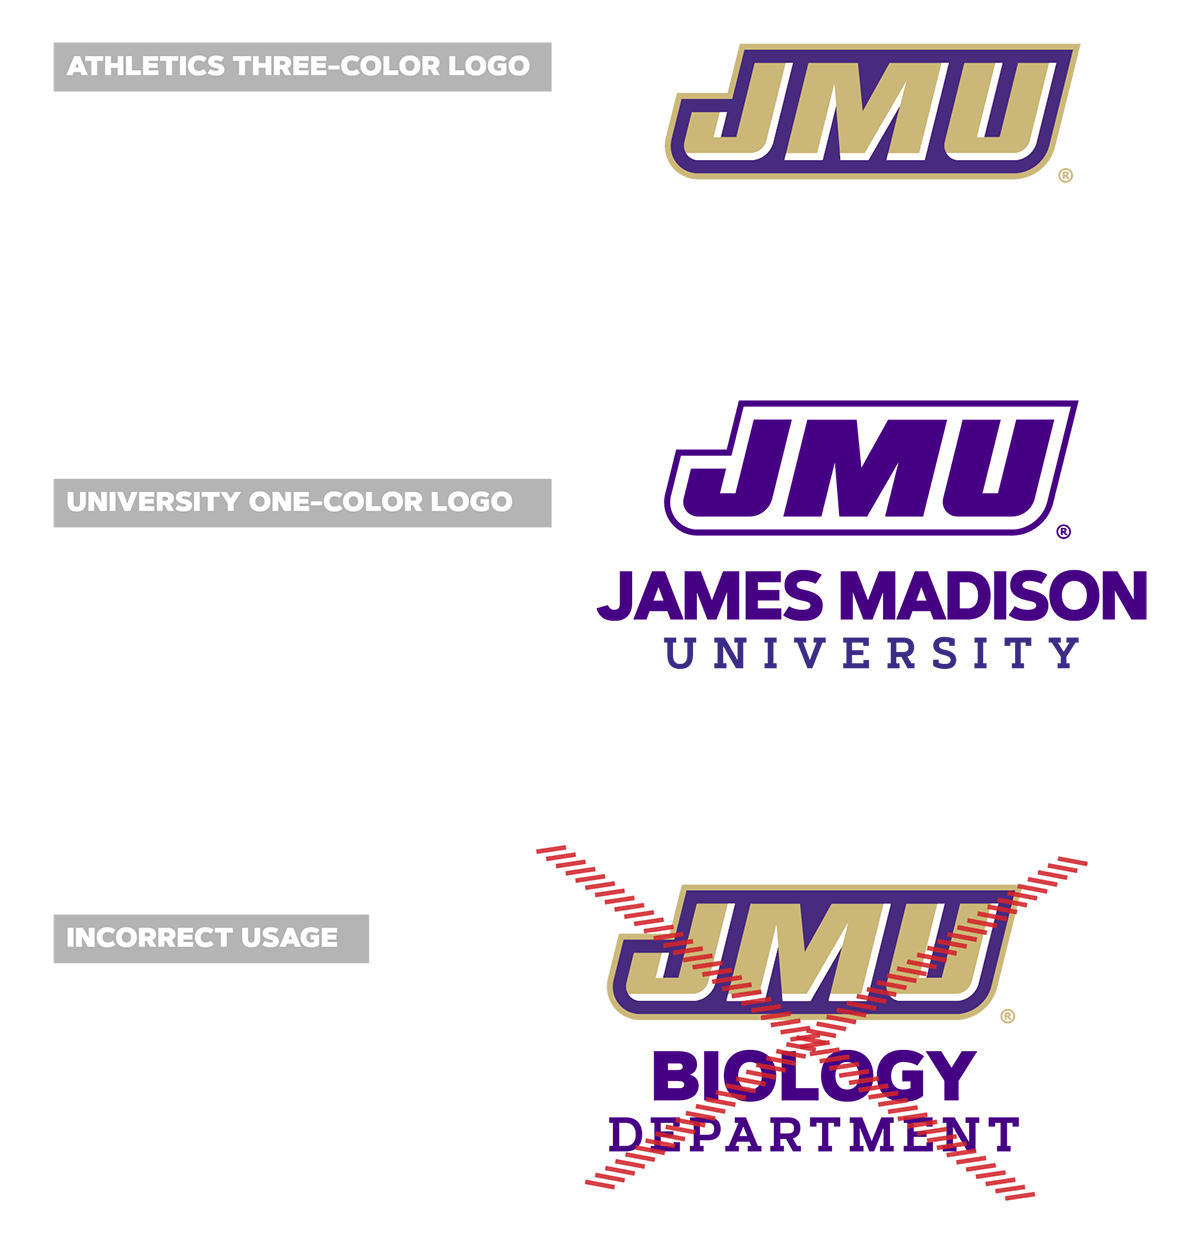 James Madison University Jmu Logos Marks